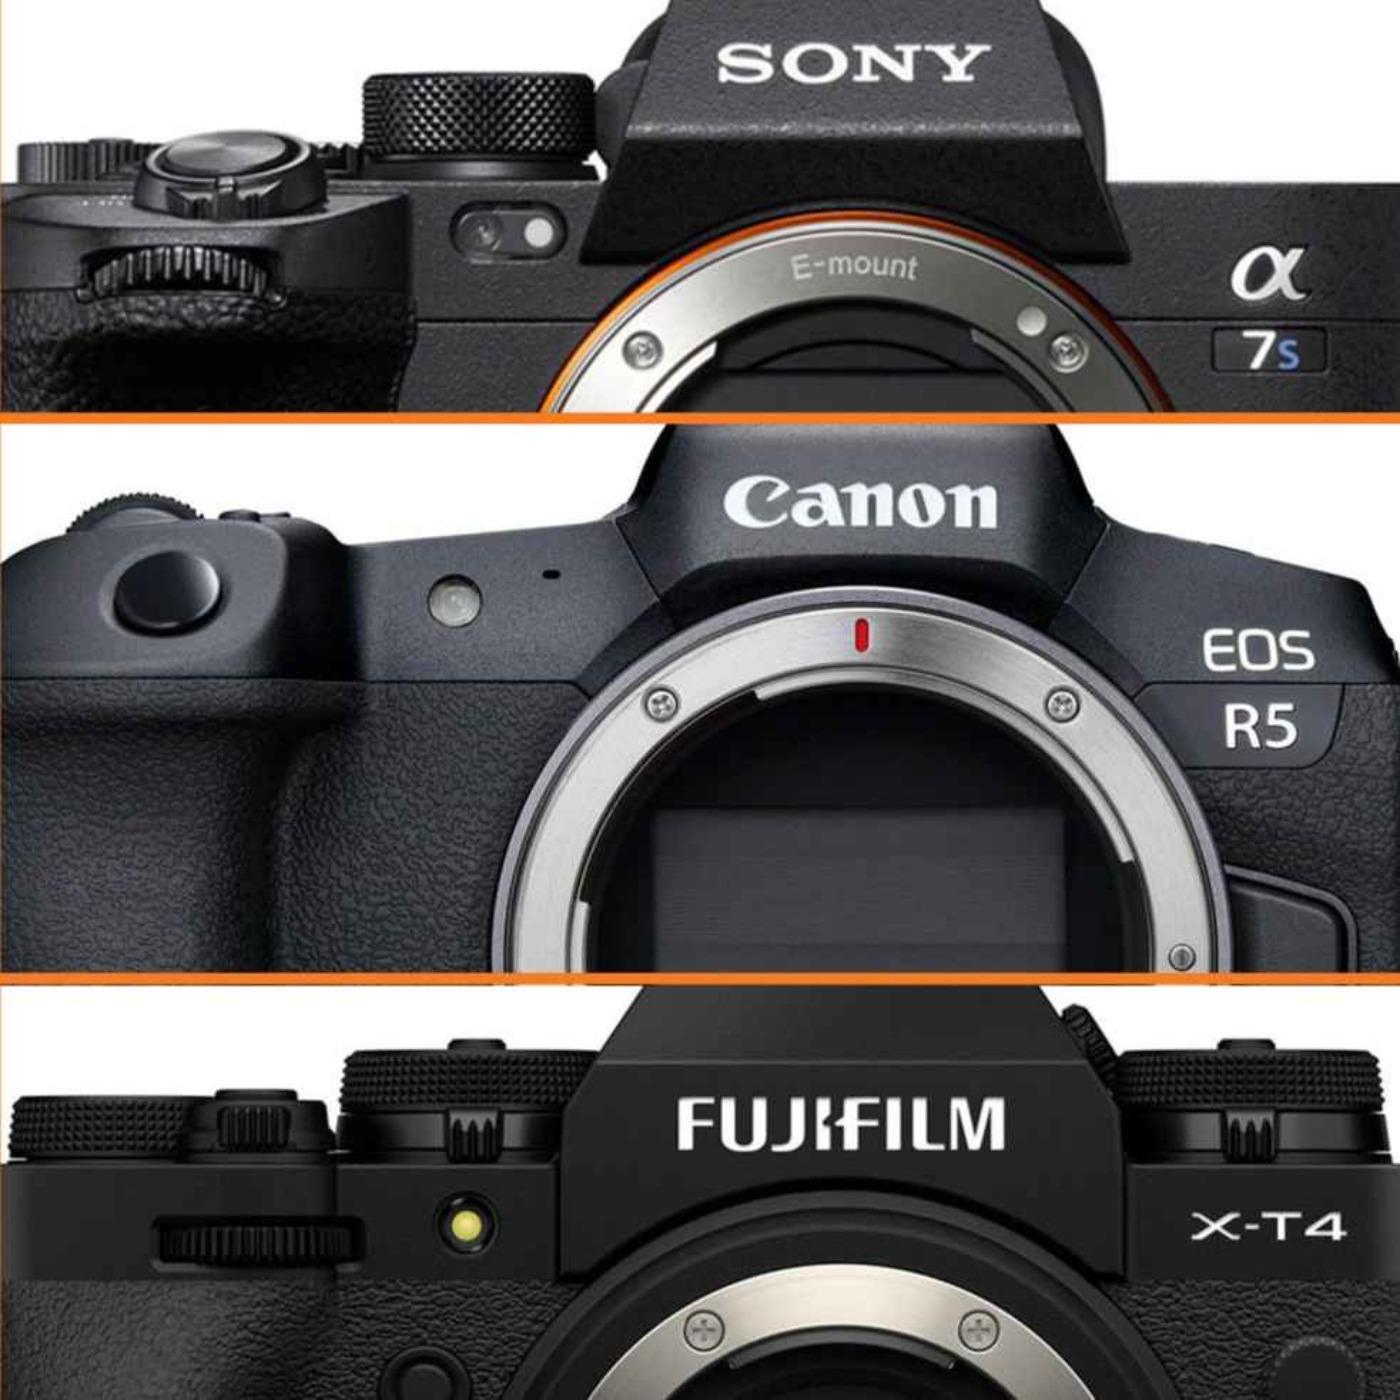 Høydepunkter fra 2020 - Canon R5, Sony A7S III, Fujifilm X-T4 +++